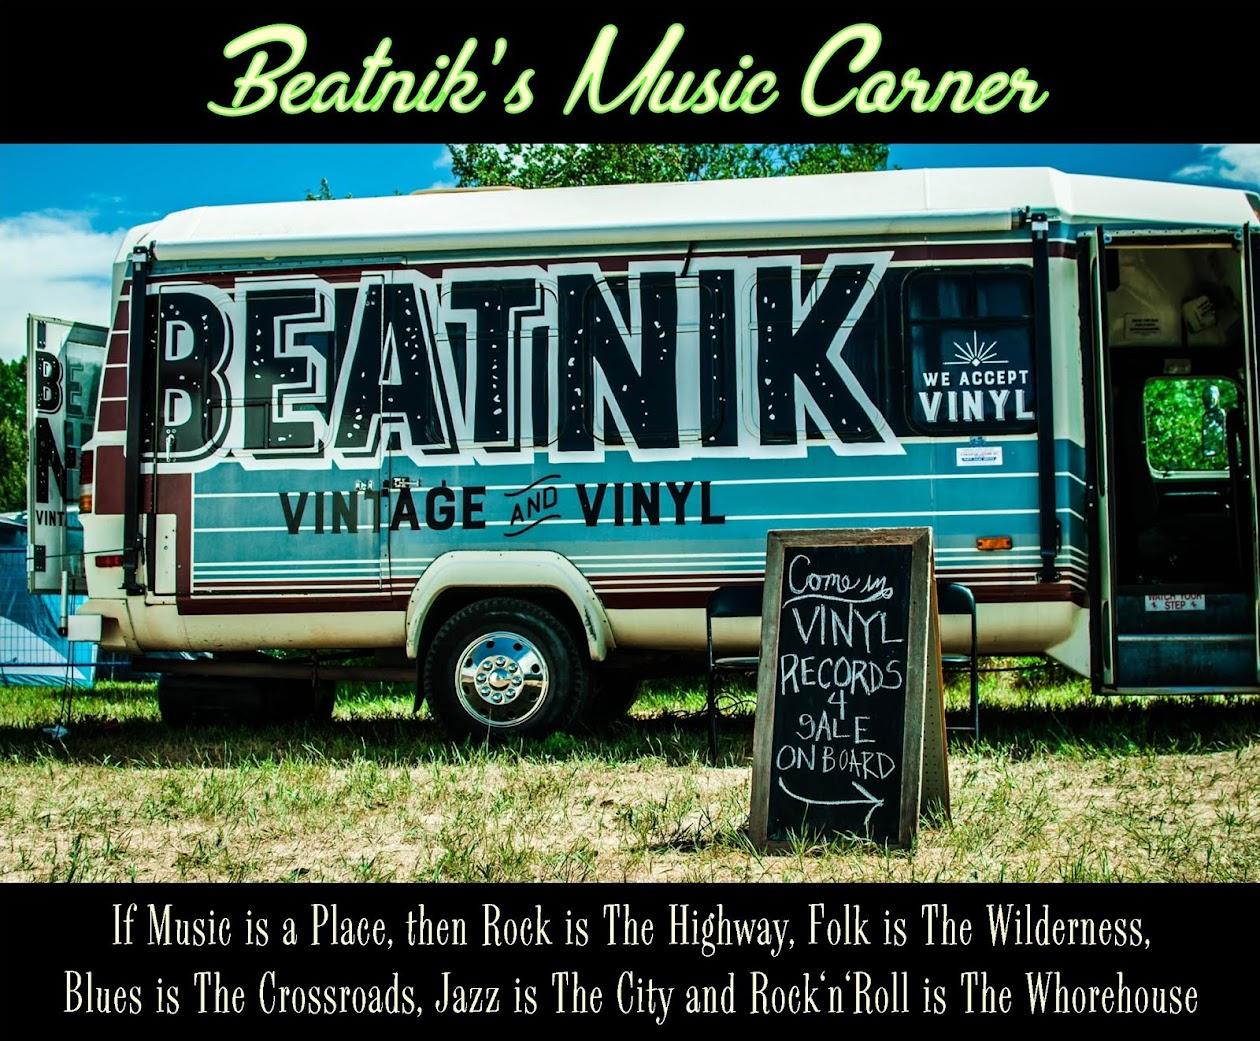 Beatnik's Music Corner